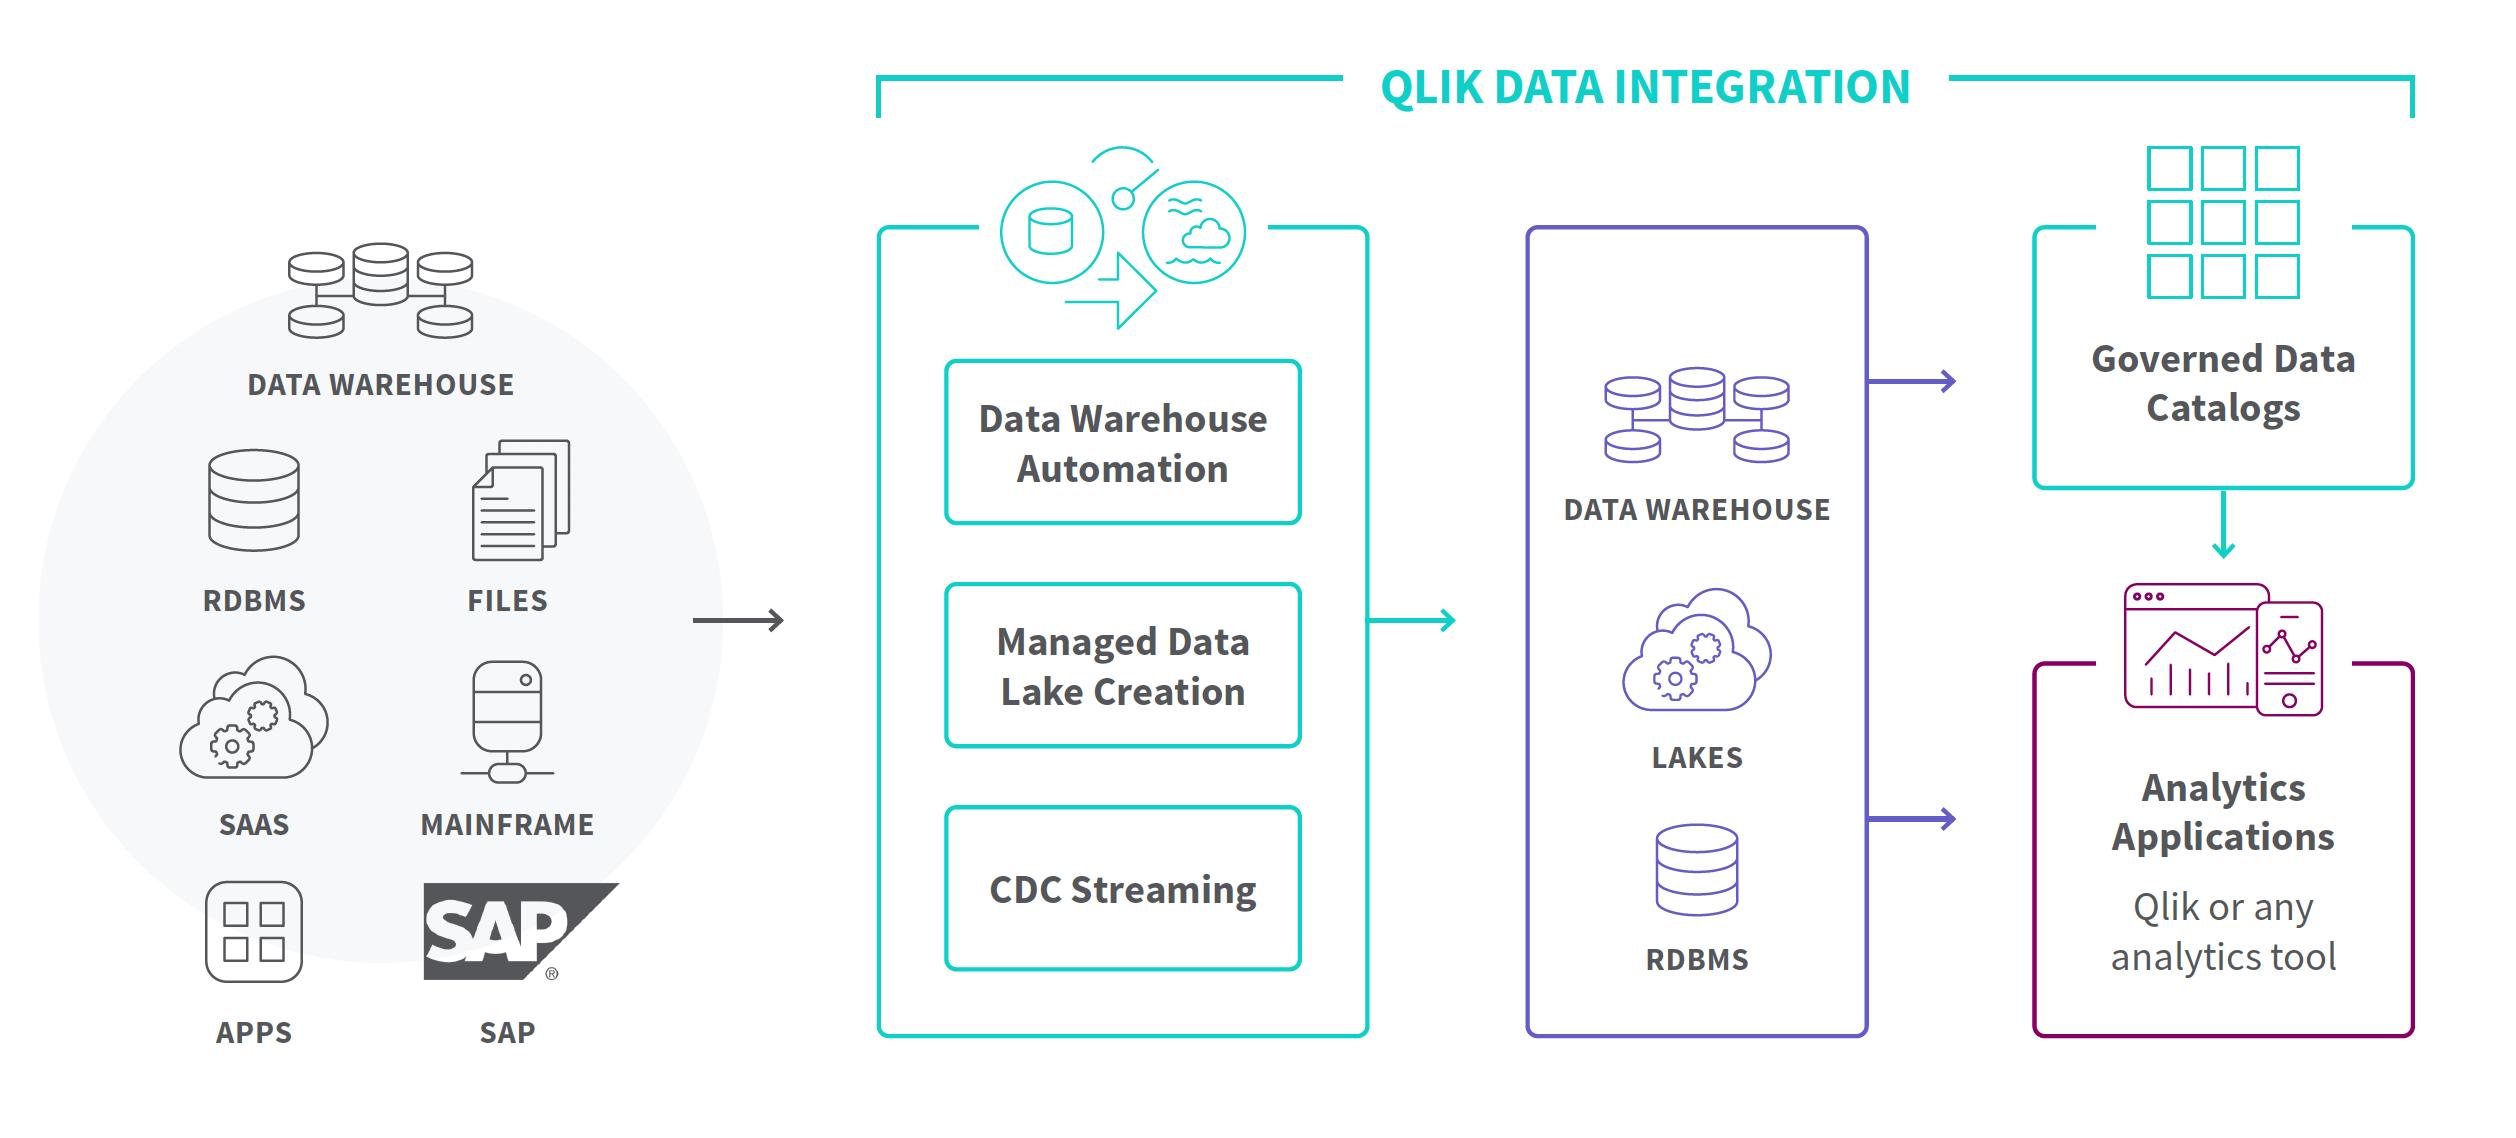 Qlik's platform at a glance